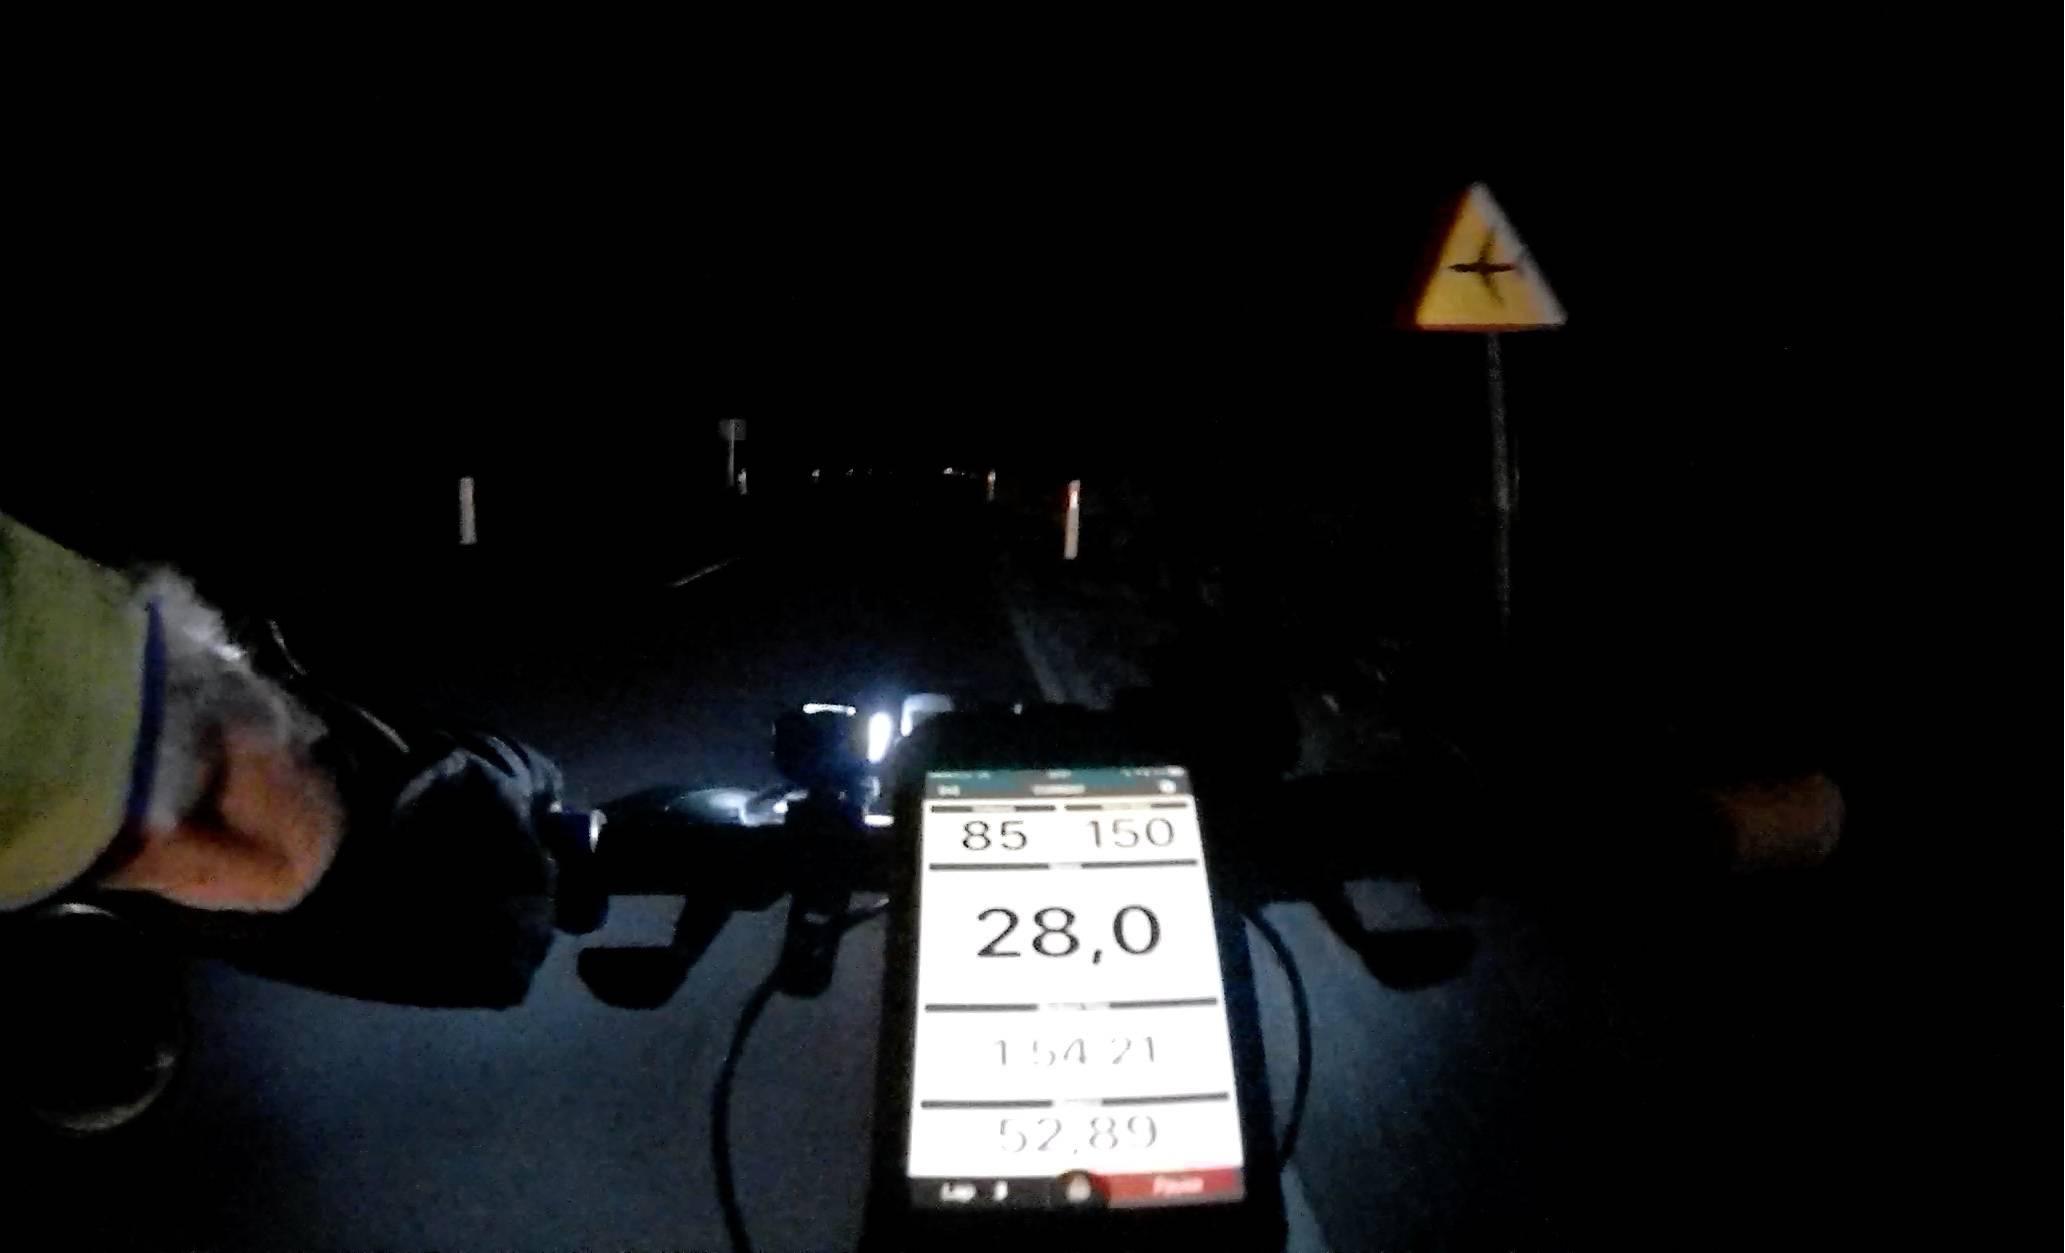 Rokform Rugged Case na rowerze nocą